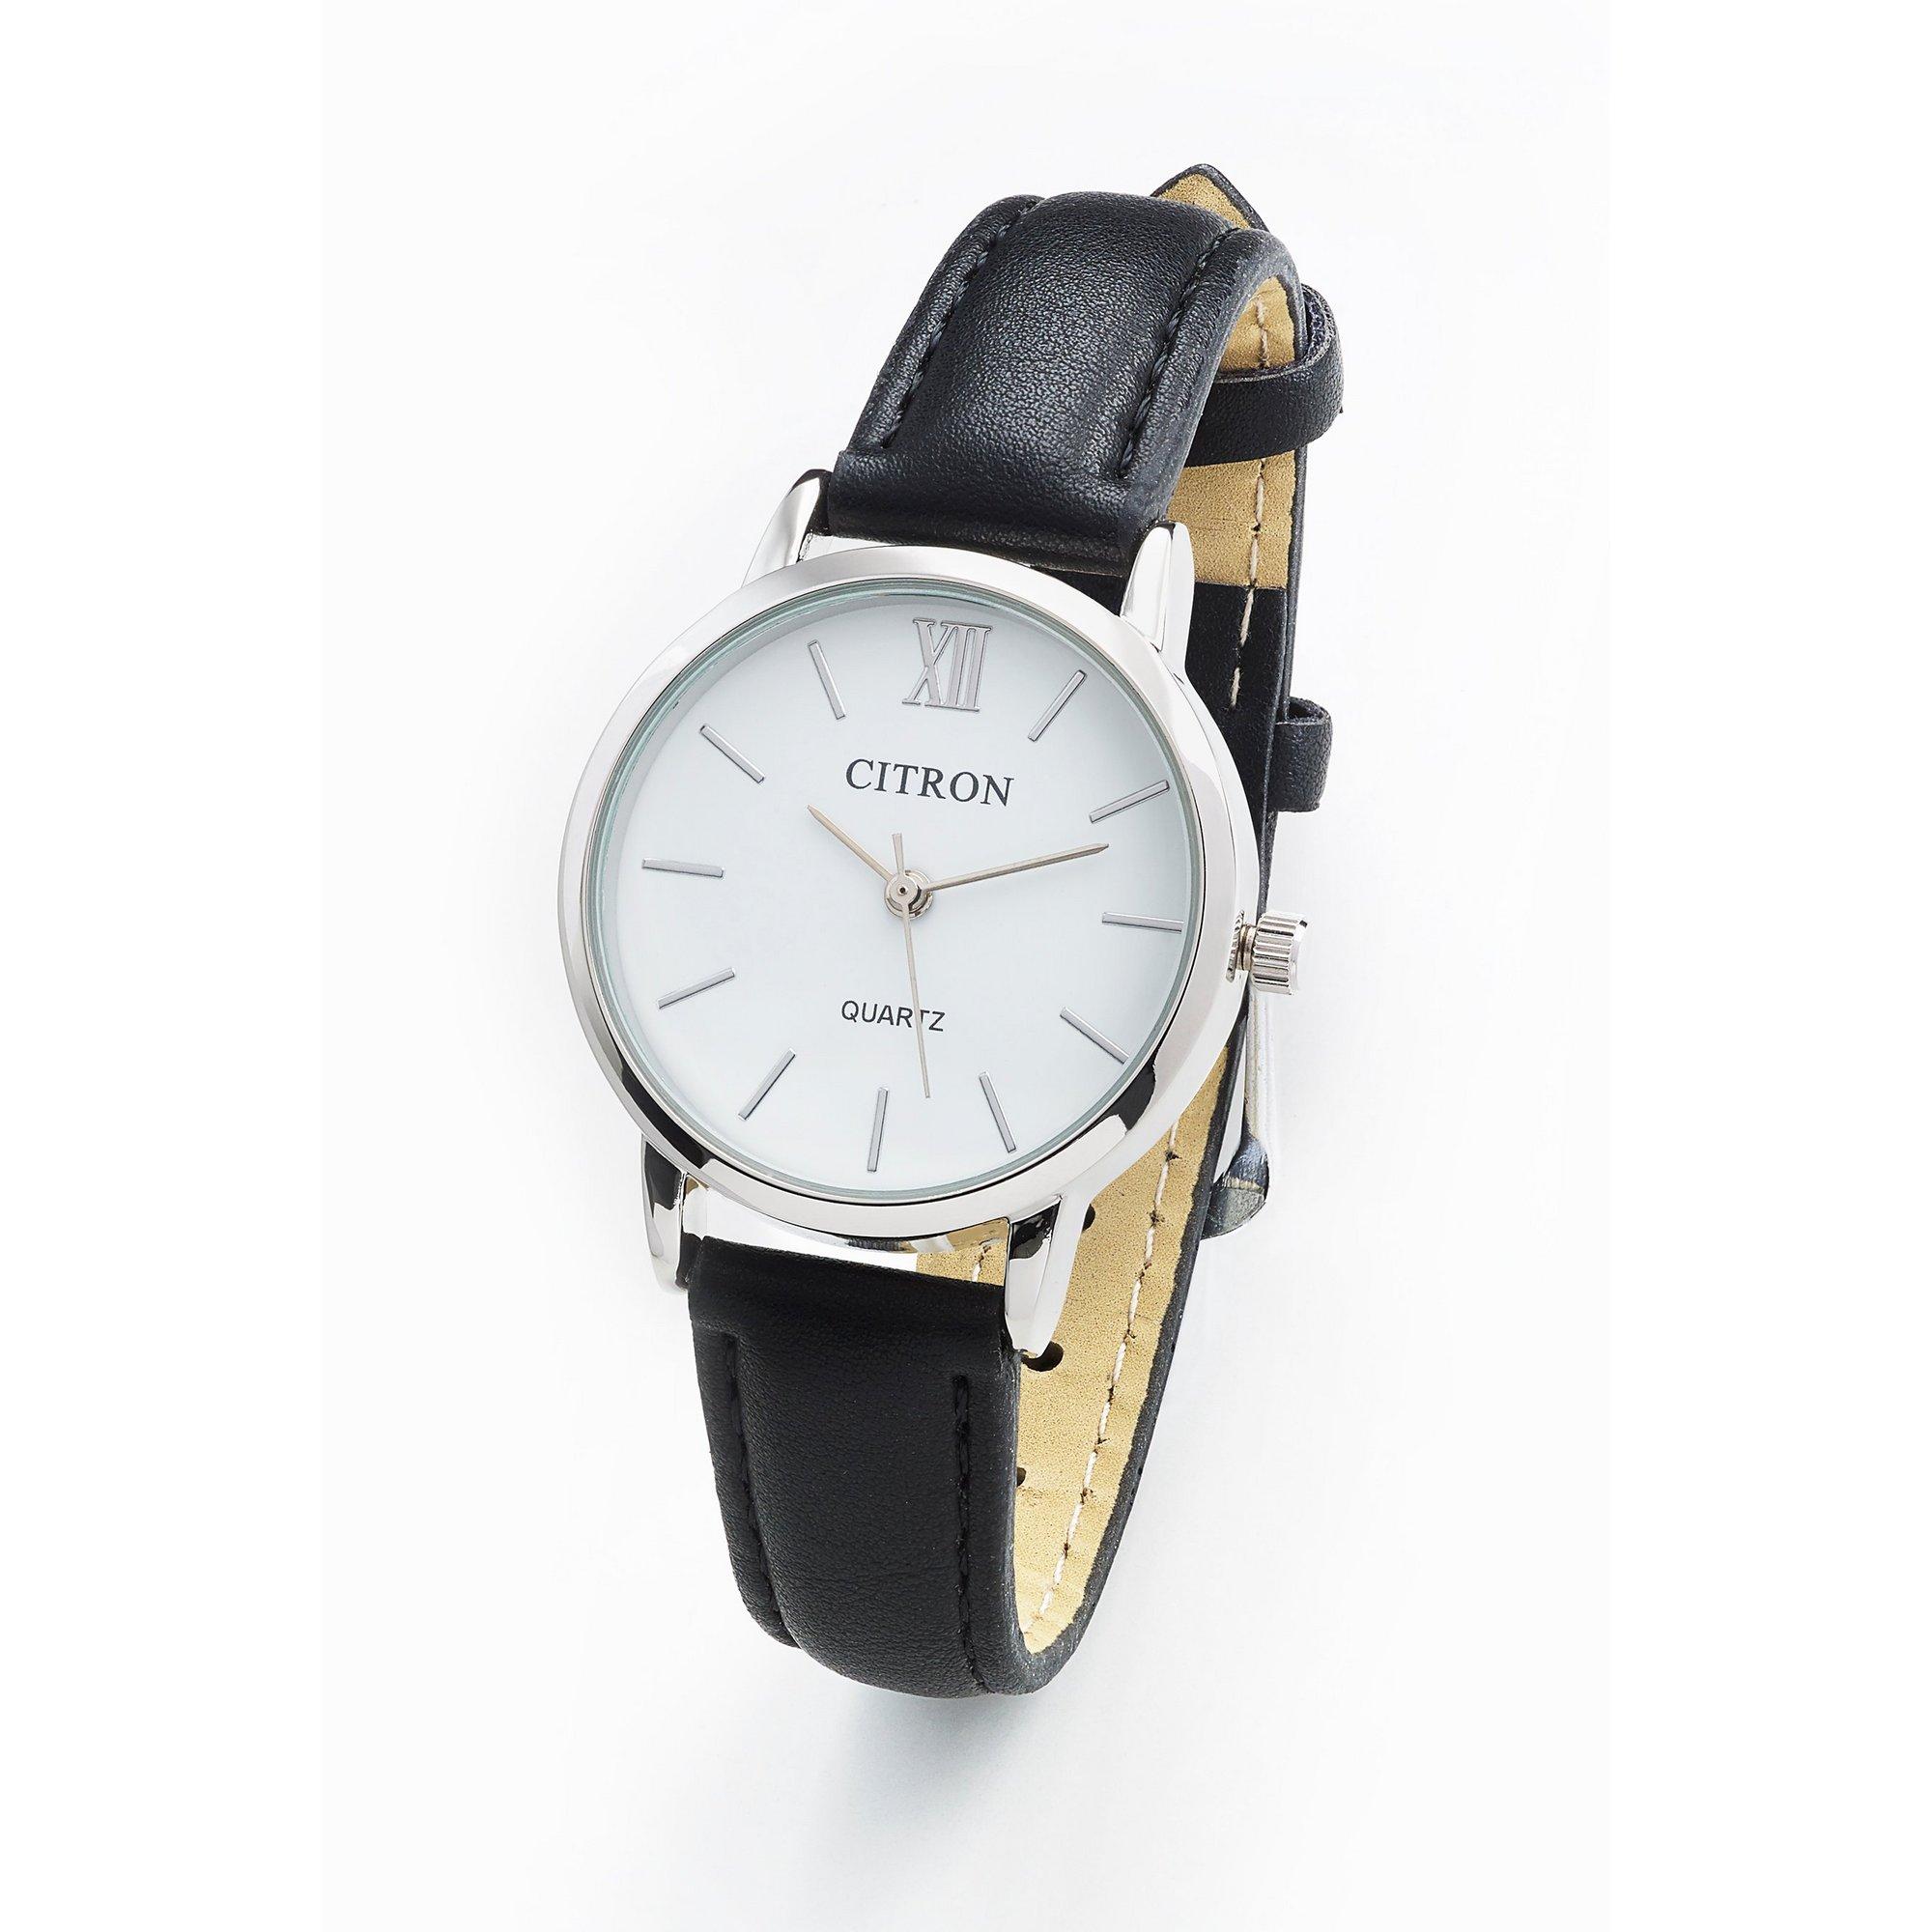 Image of Citron Black Strap Watch